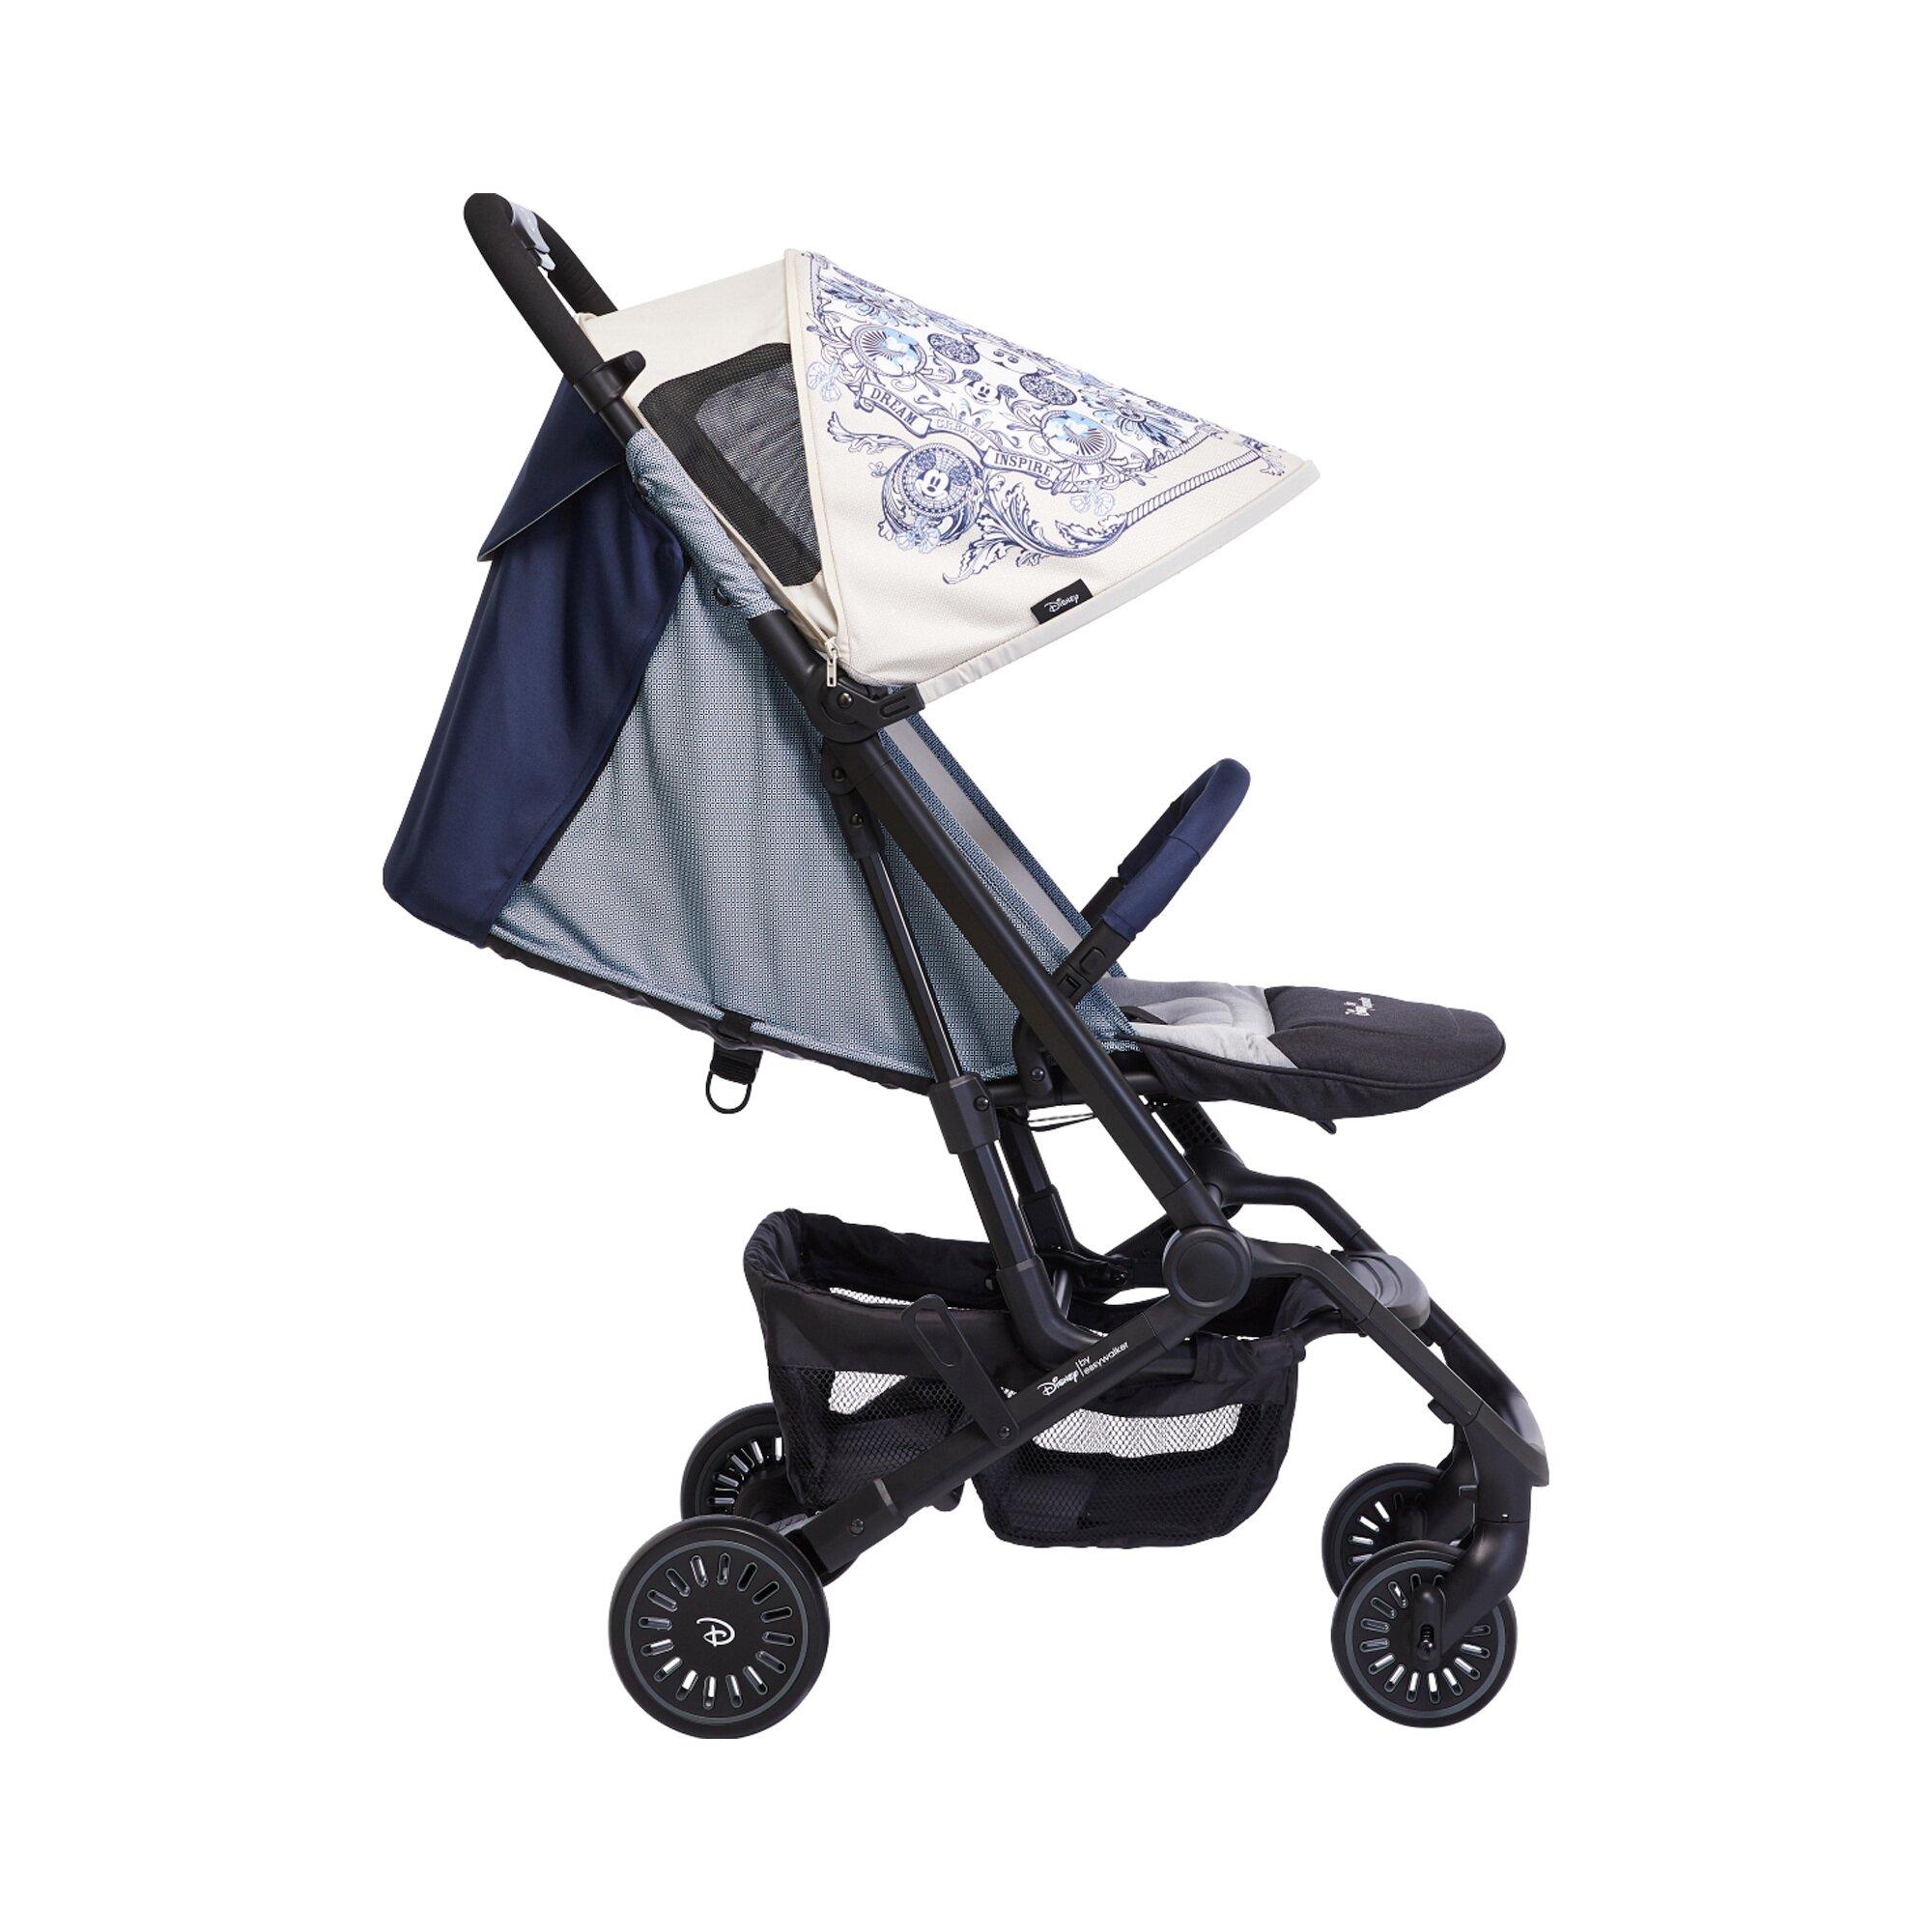 easywalker-buggy-xs-disney-mit-liegefunktion-blau